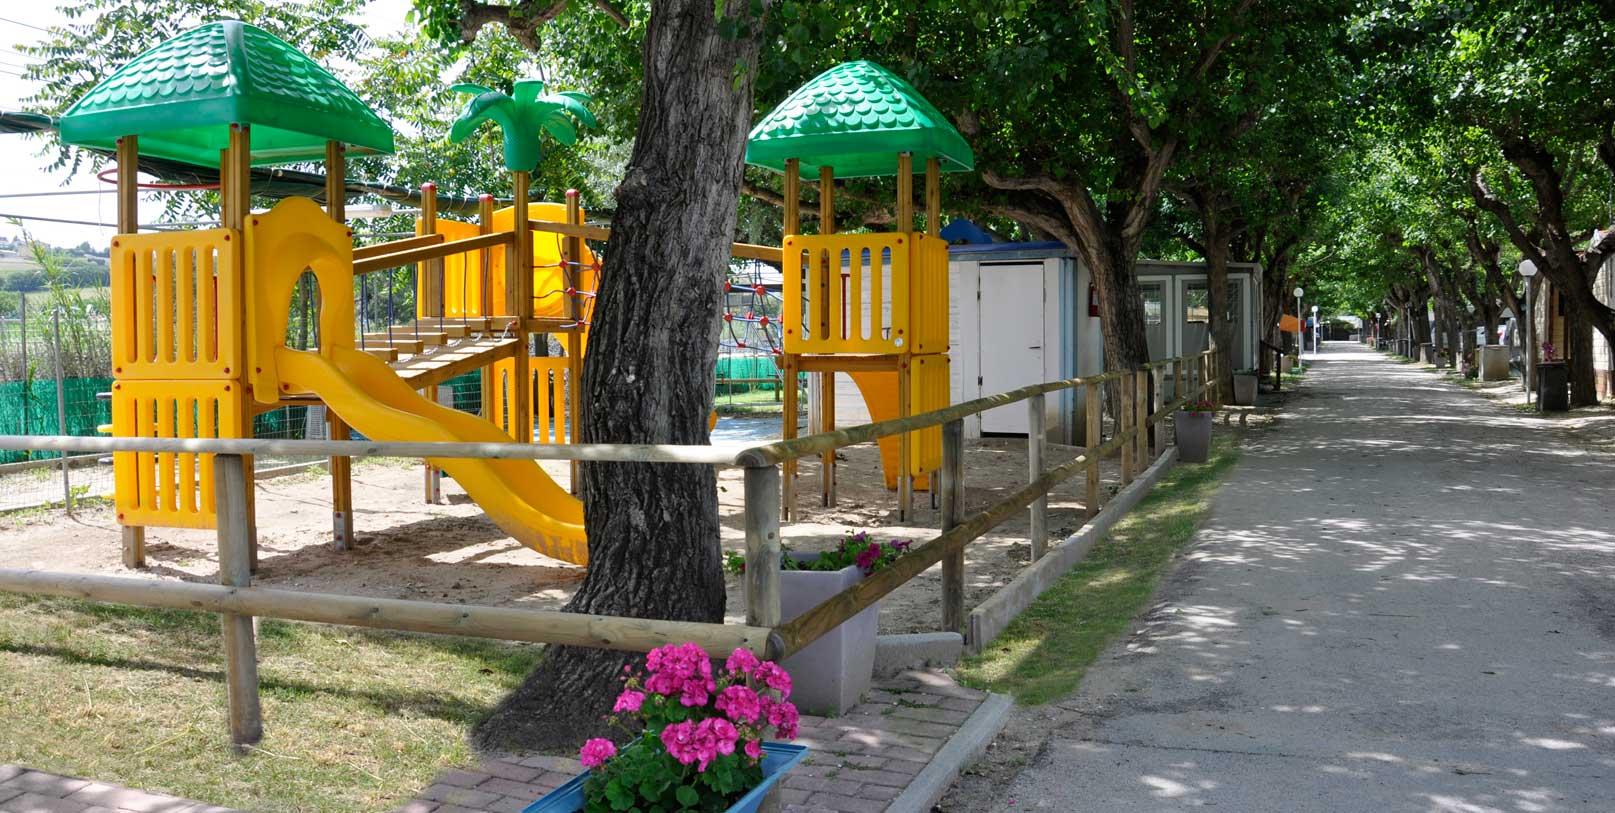 camping senigallia slide 3